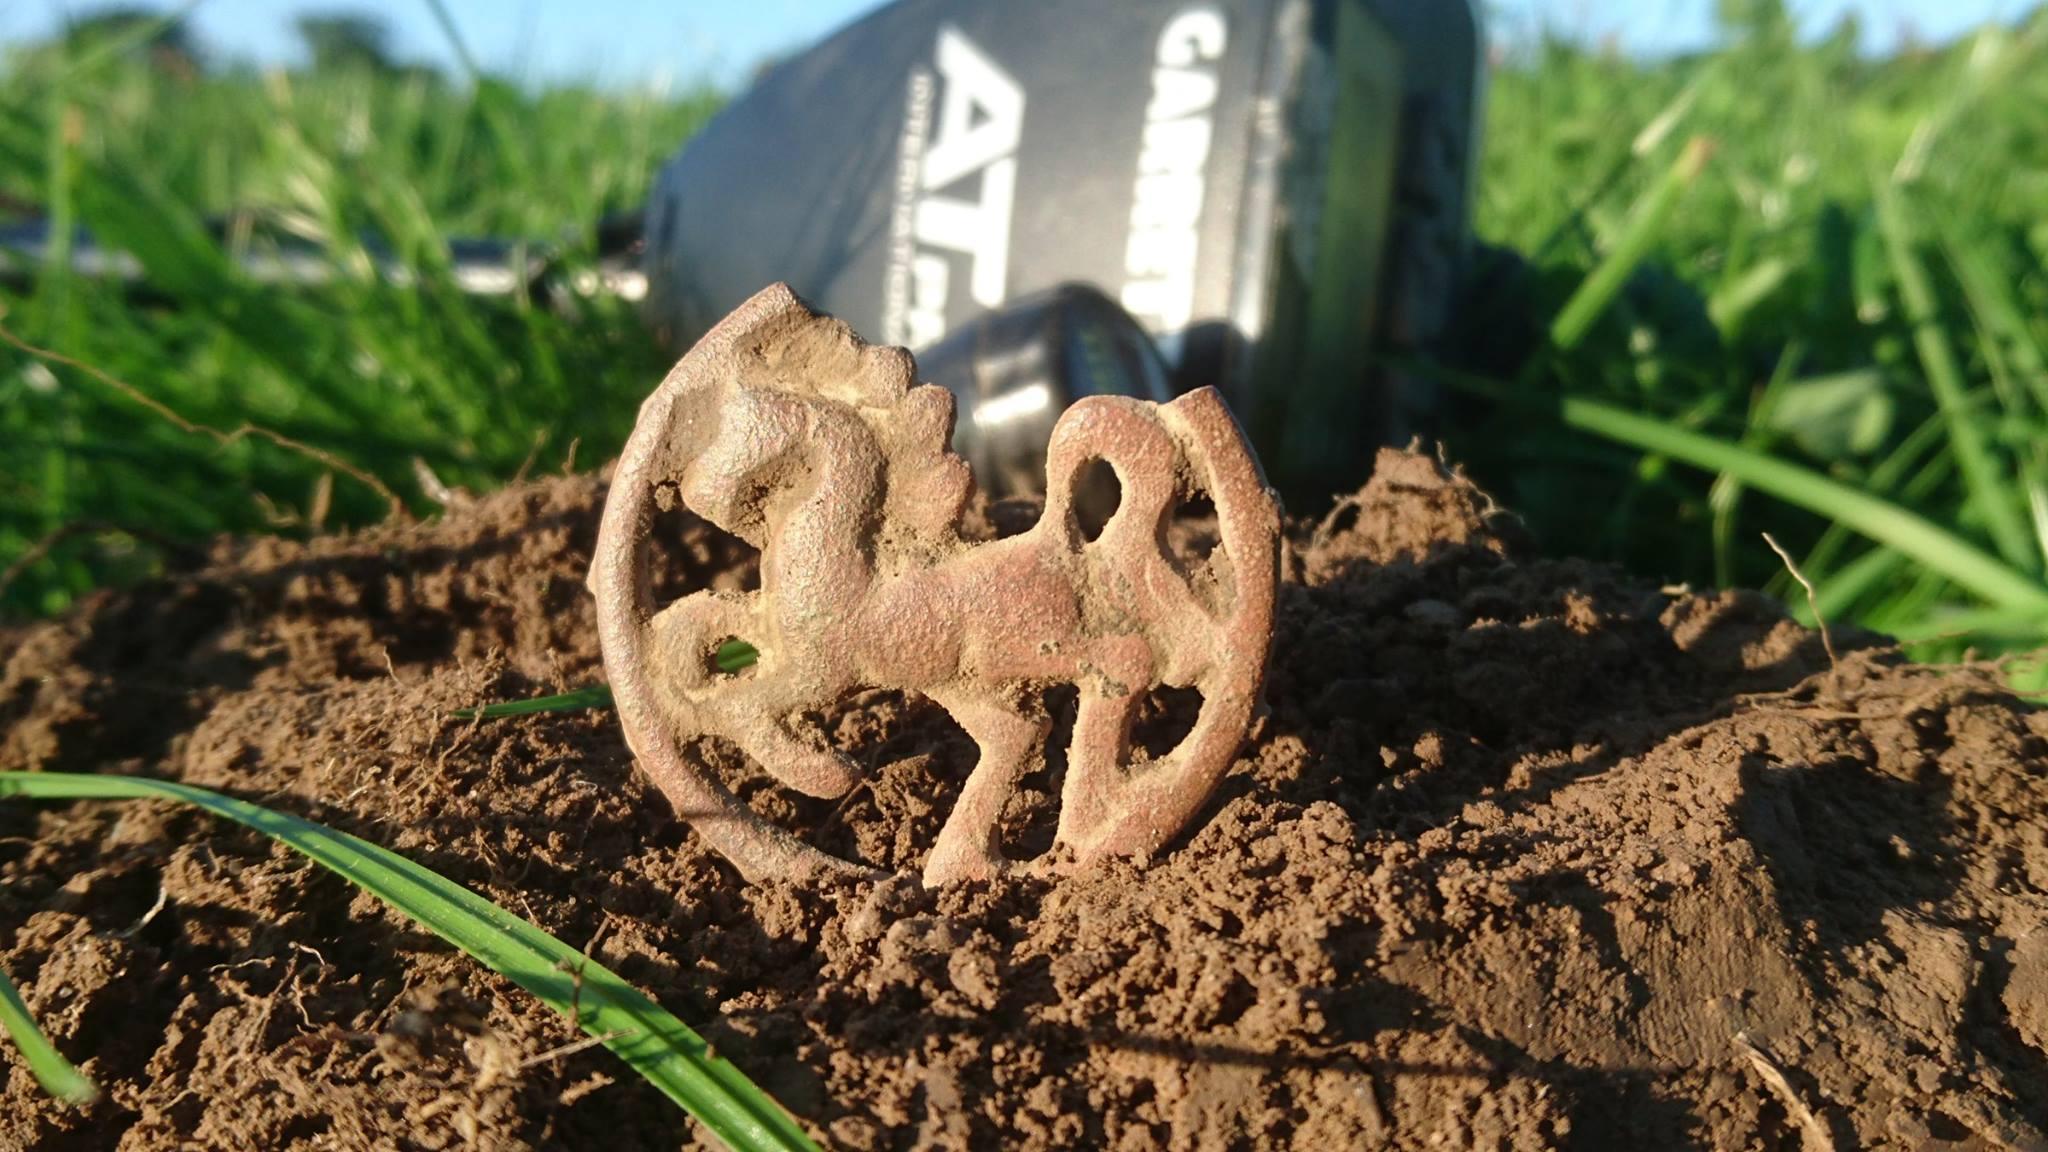 Rampant Horse Brass